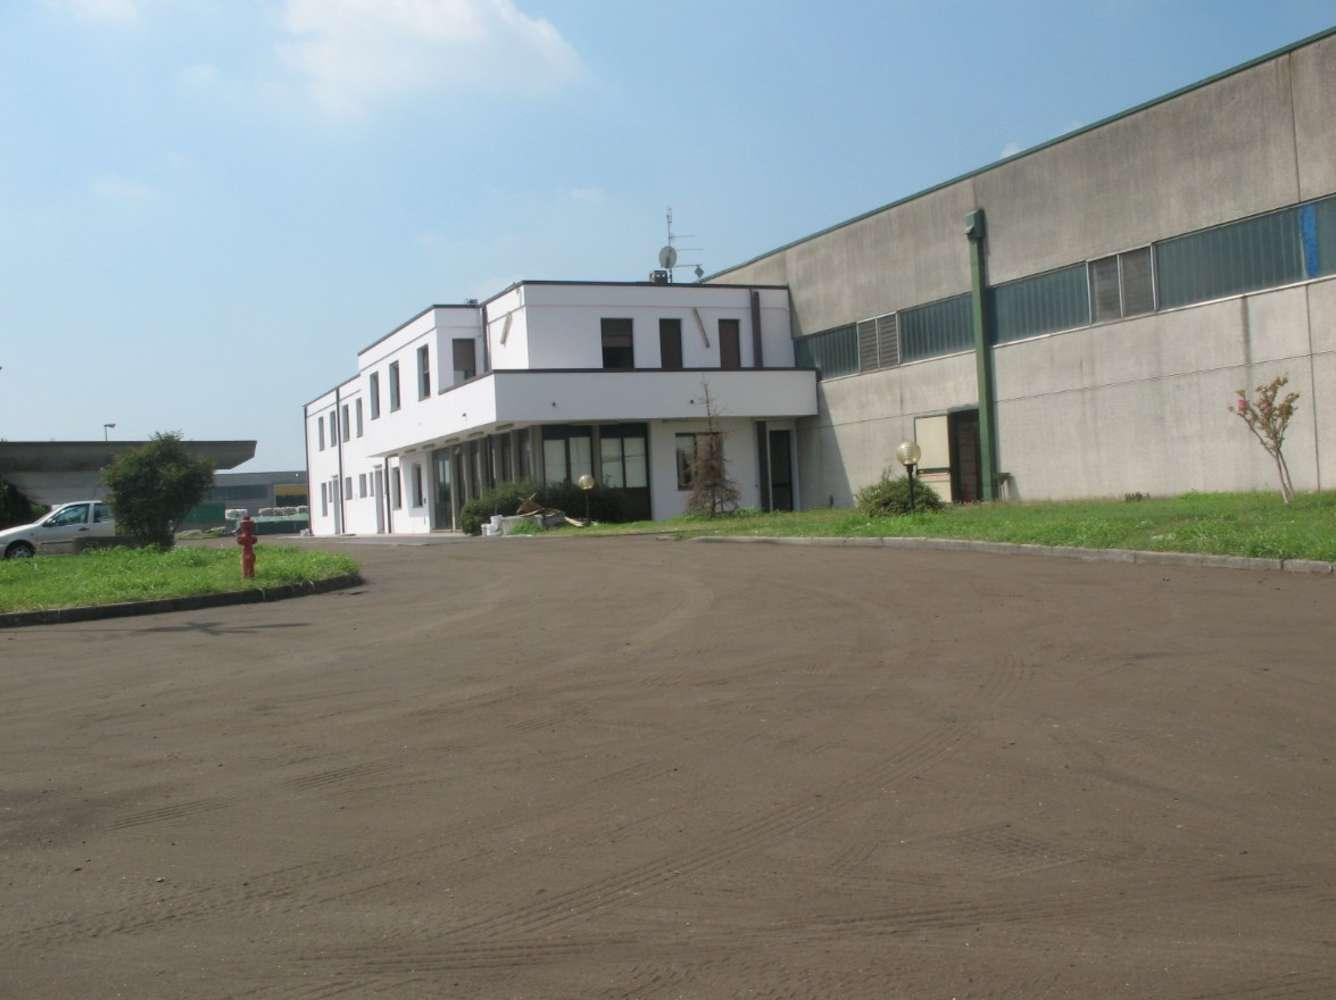 Magazzini industriali e logistici Monselice saiace, 35043 - Monselice - Saiace